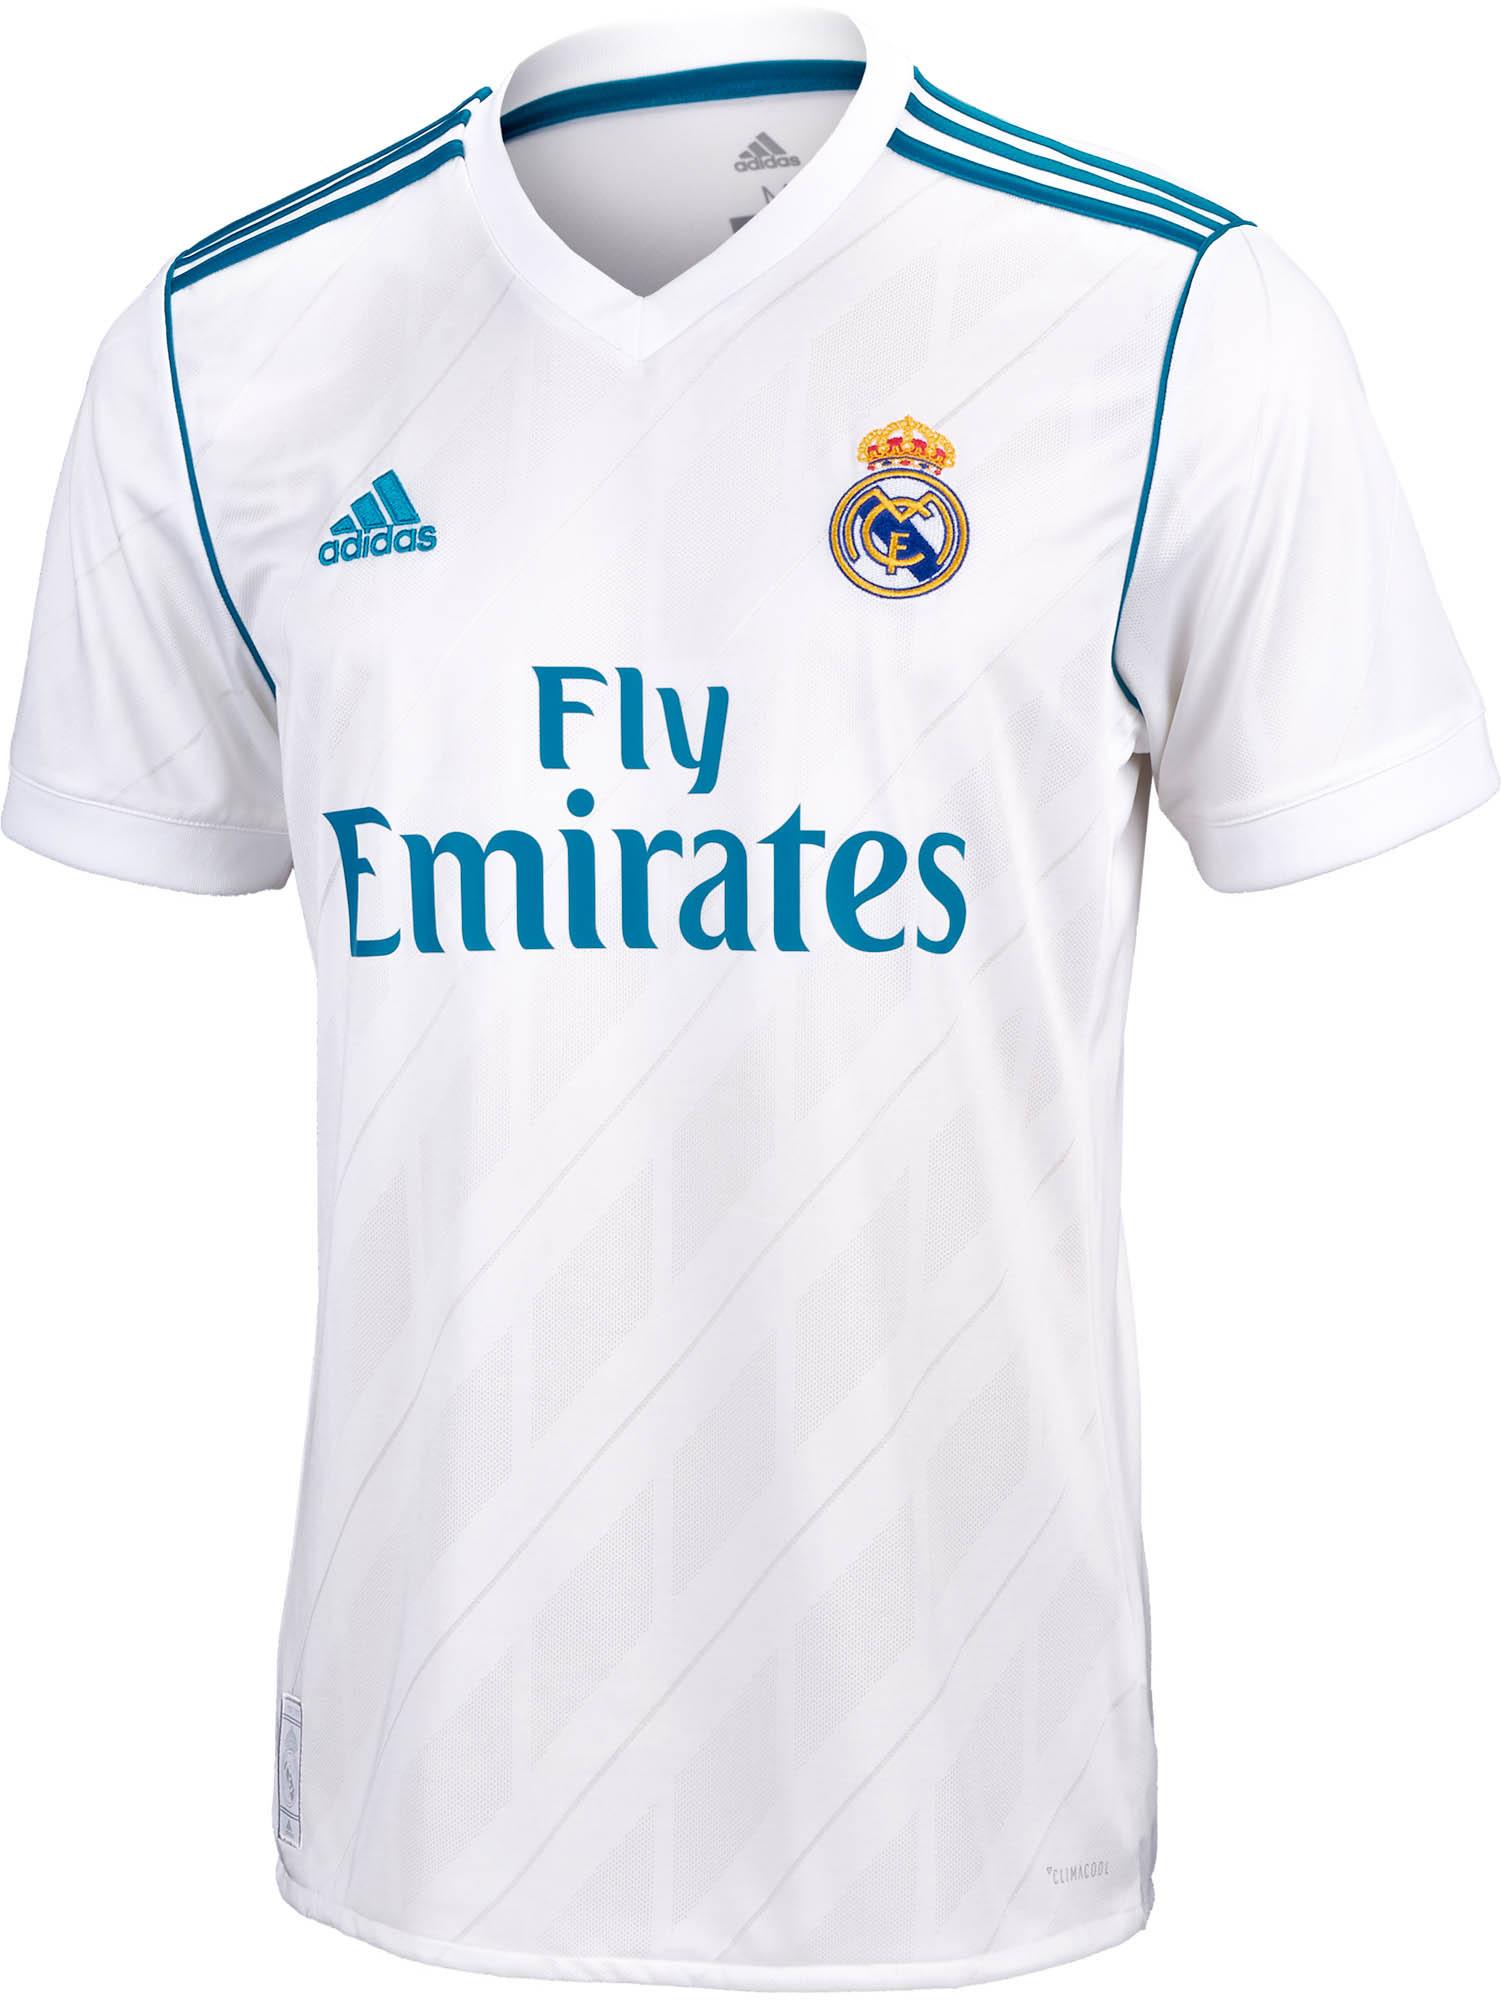 59b5fc4e174 adidas Kids Real Madrid Jersey - 2017 18 Soccer Jerseys